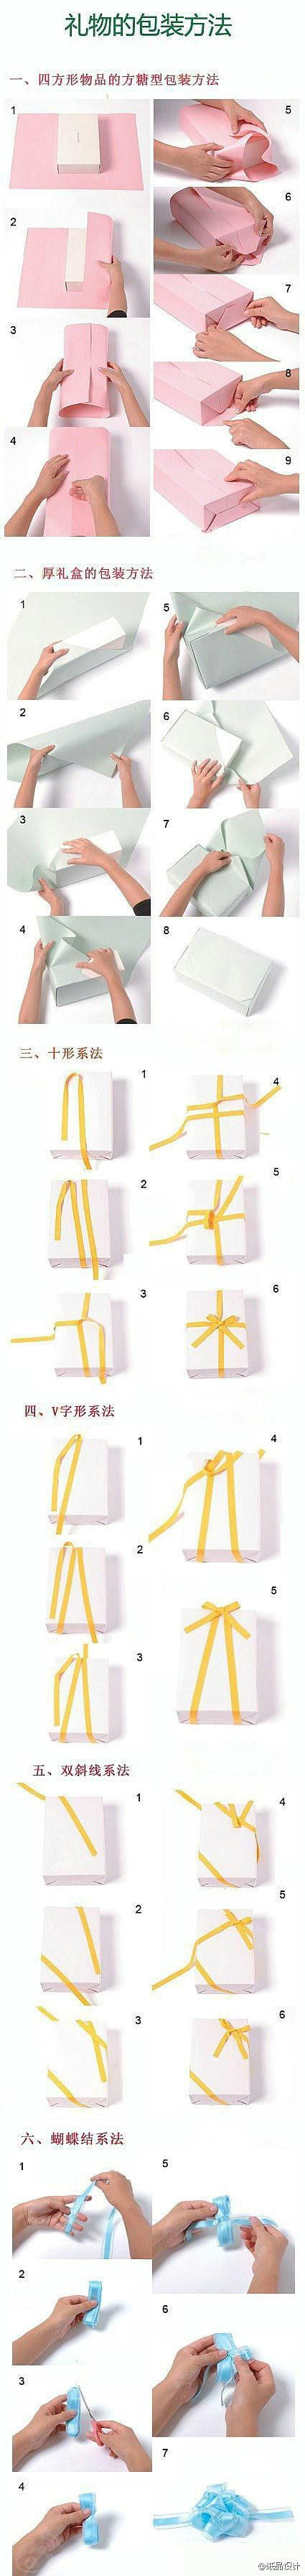 Gift box packaging method